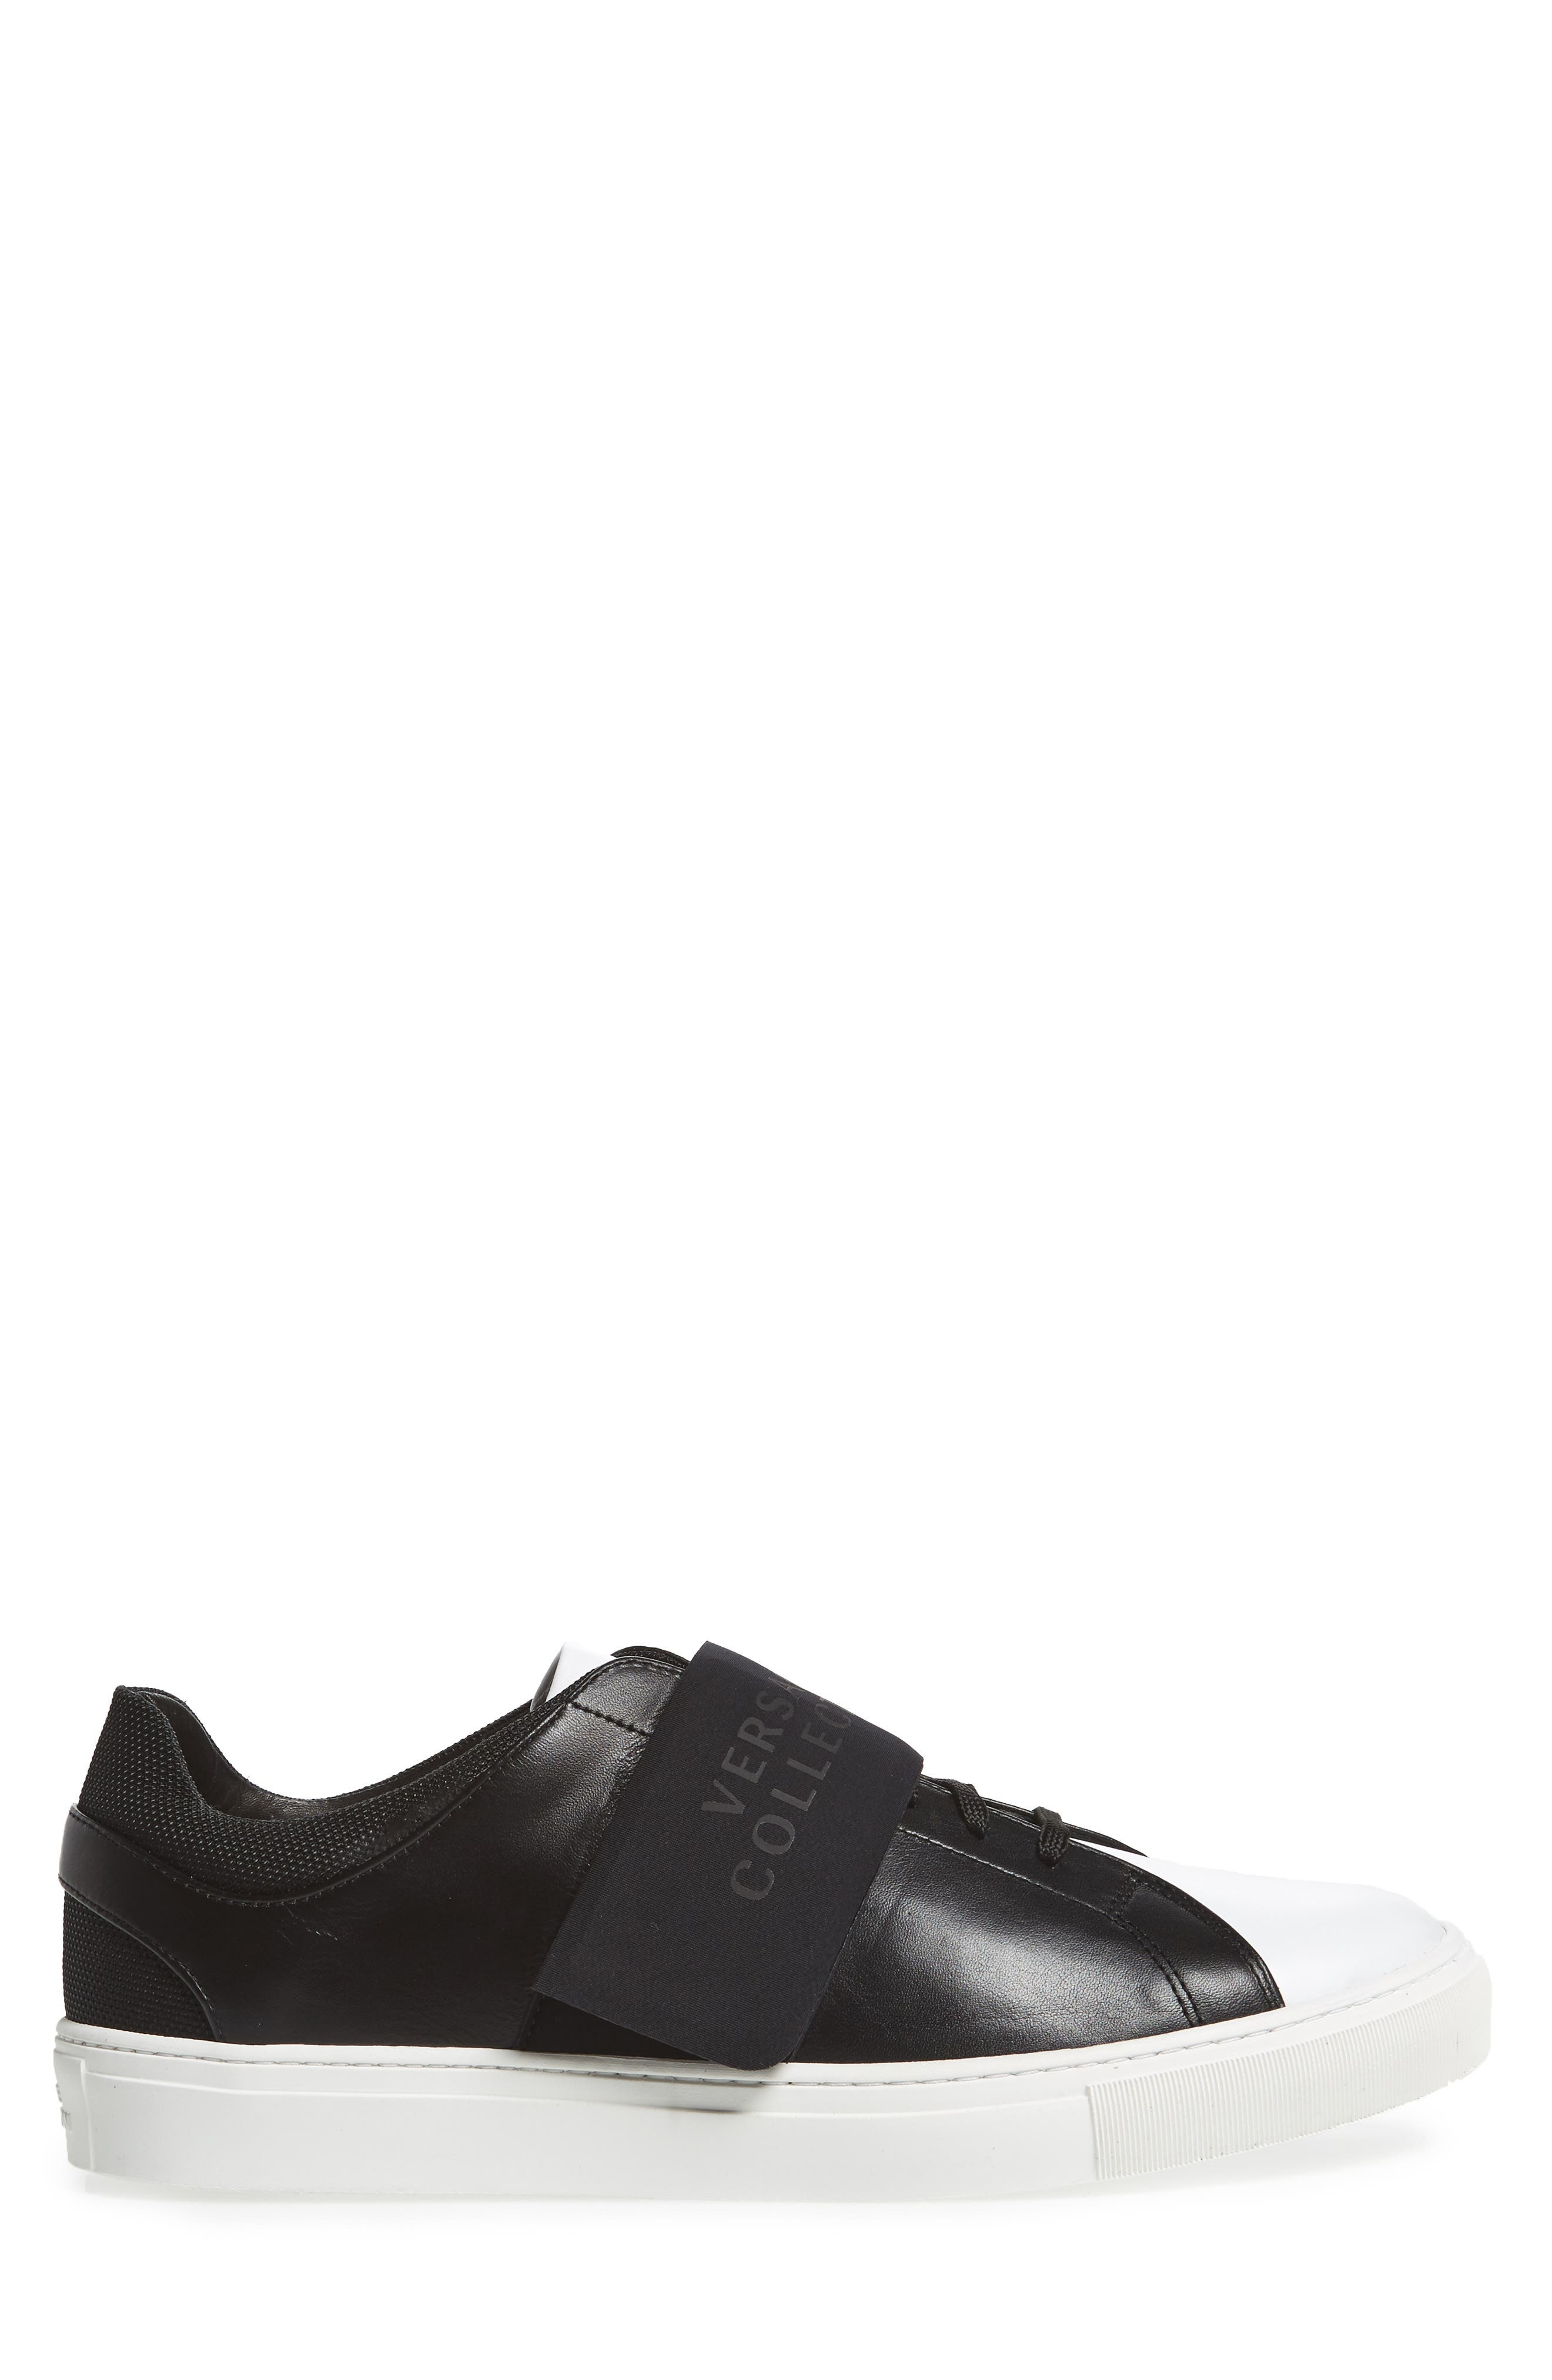 Strap Sneaker,                             Alternate thumbnail 3, color,                             Bianco/ Nero Leather